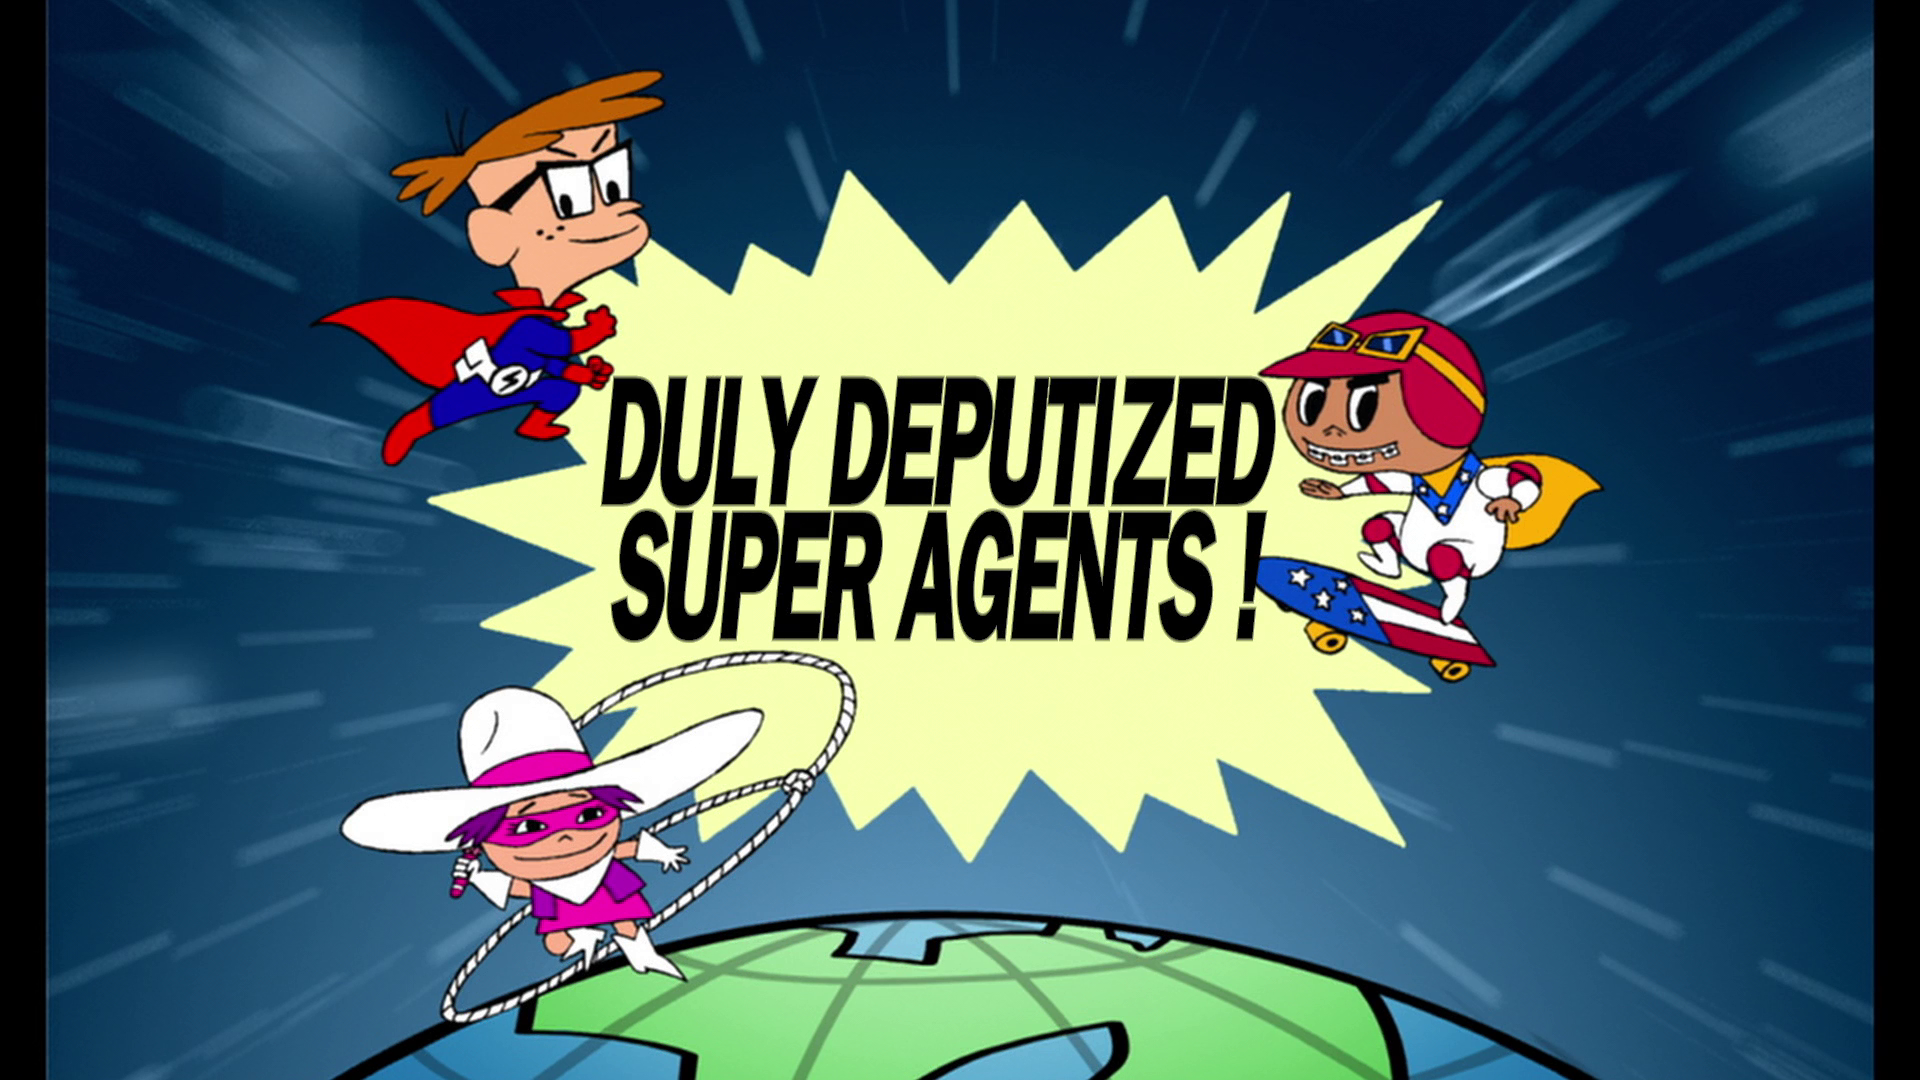 Duly Deputized Super Agents!